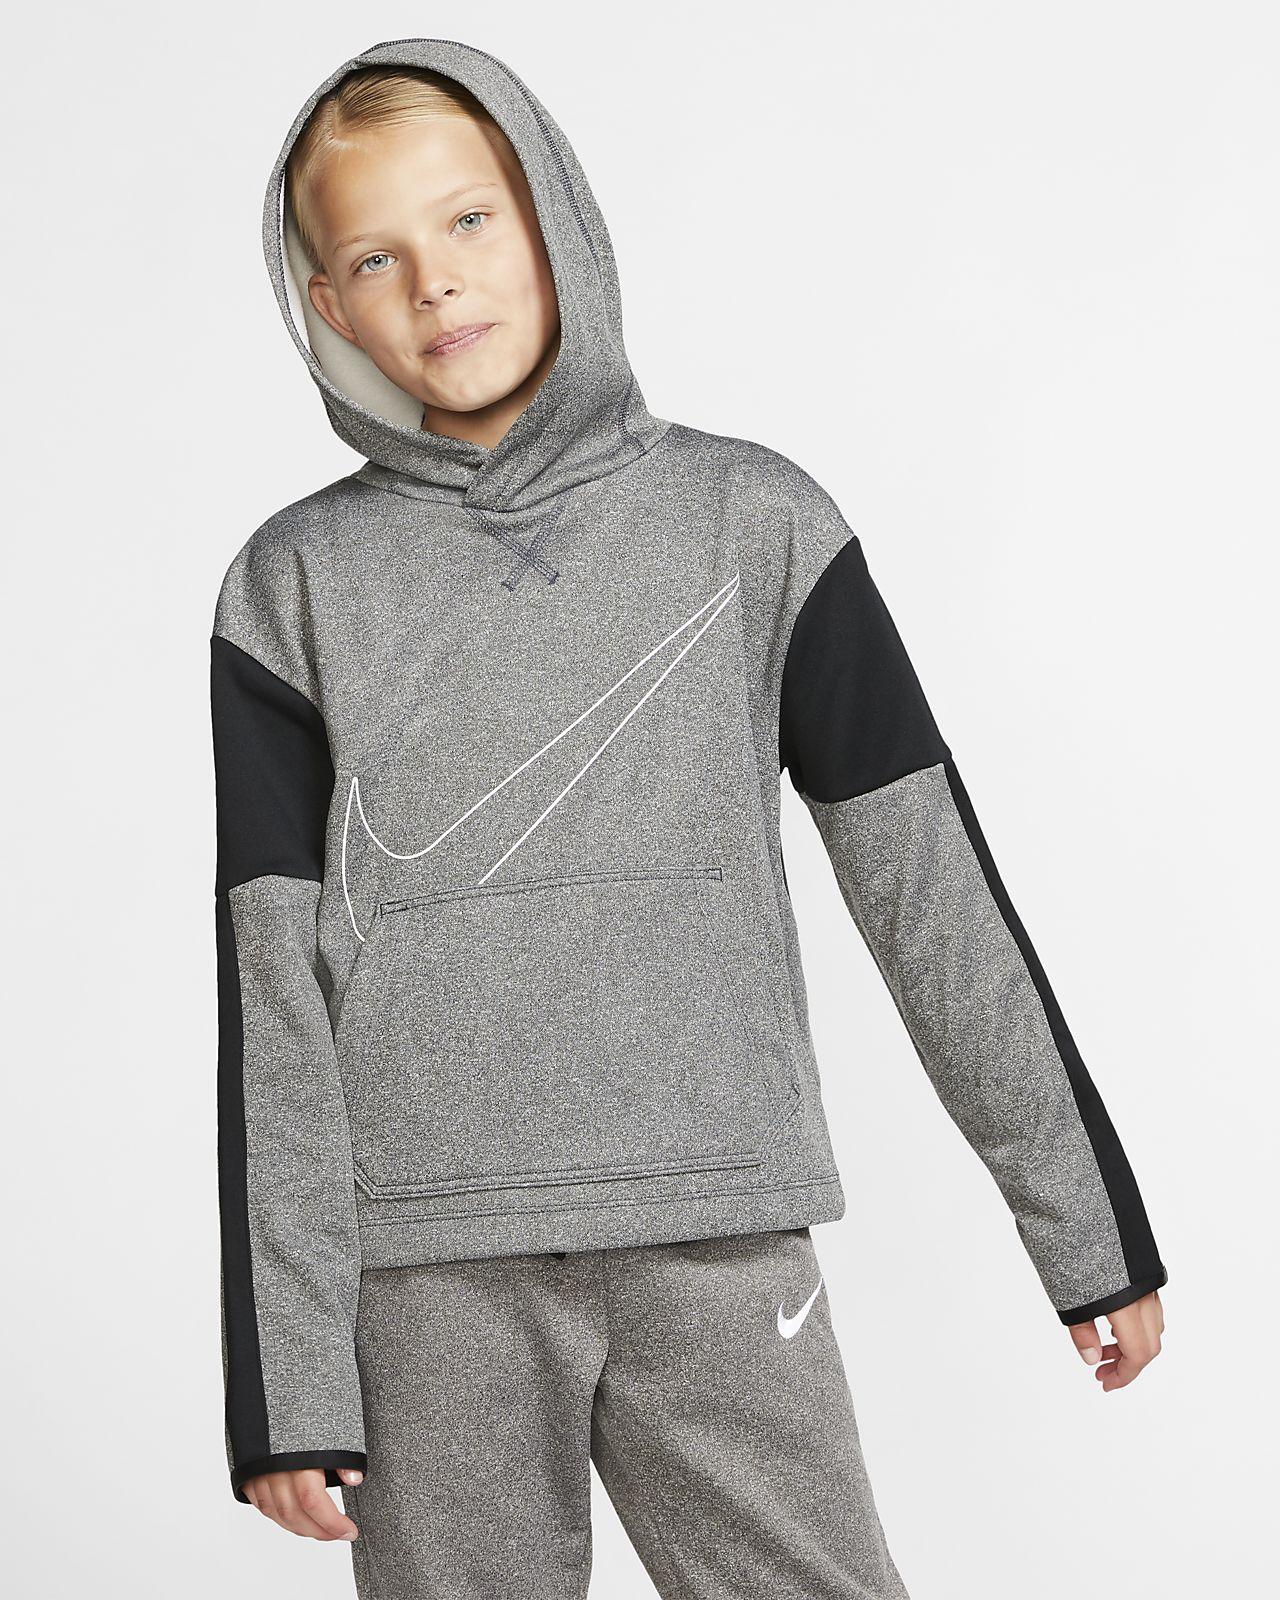 Nike Girls Therma Fit Graphic Sweatshirt Small